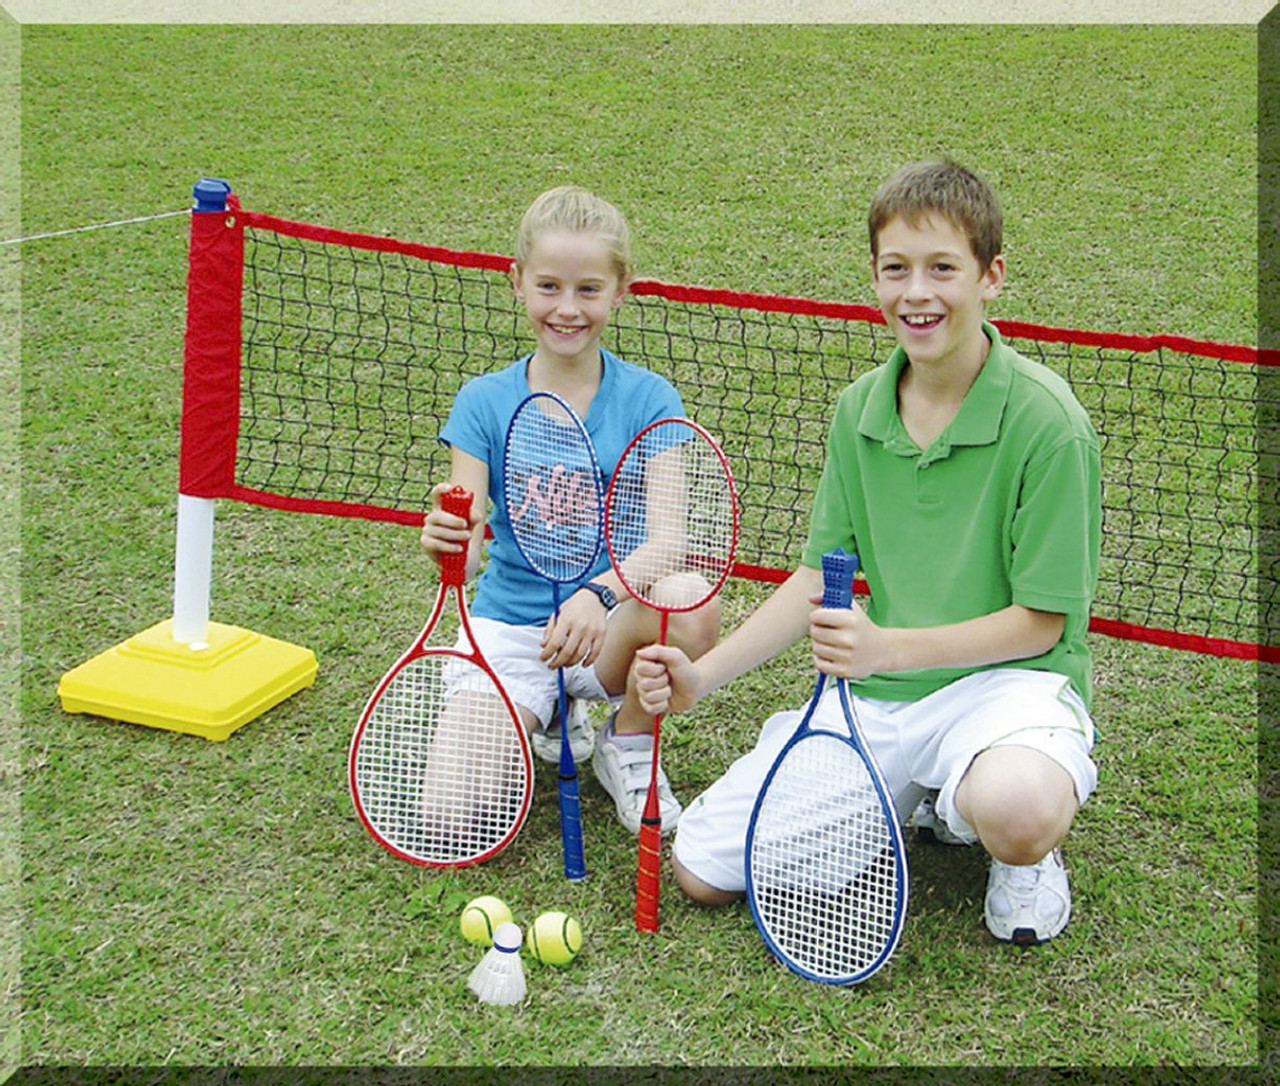 2 in1 Childrens Tennis Badminton Trainer